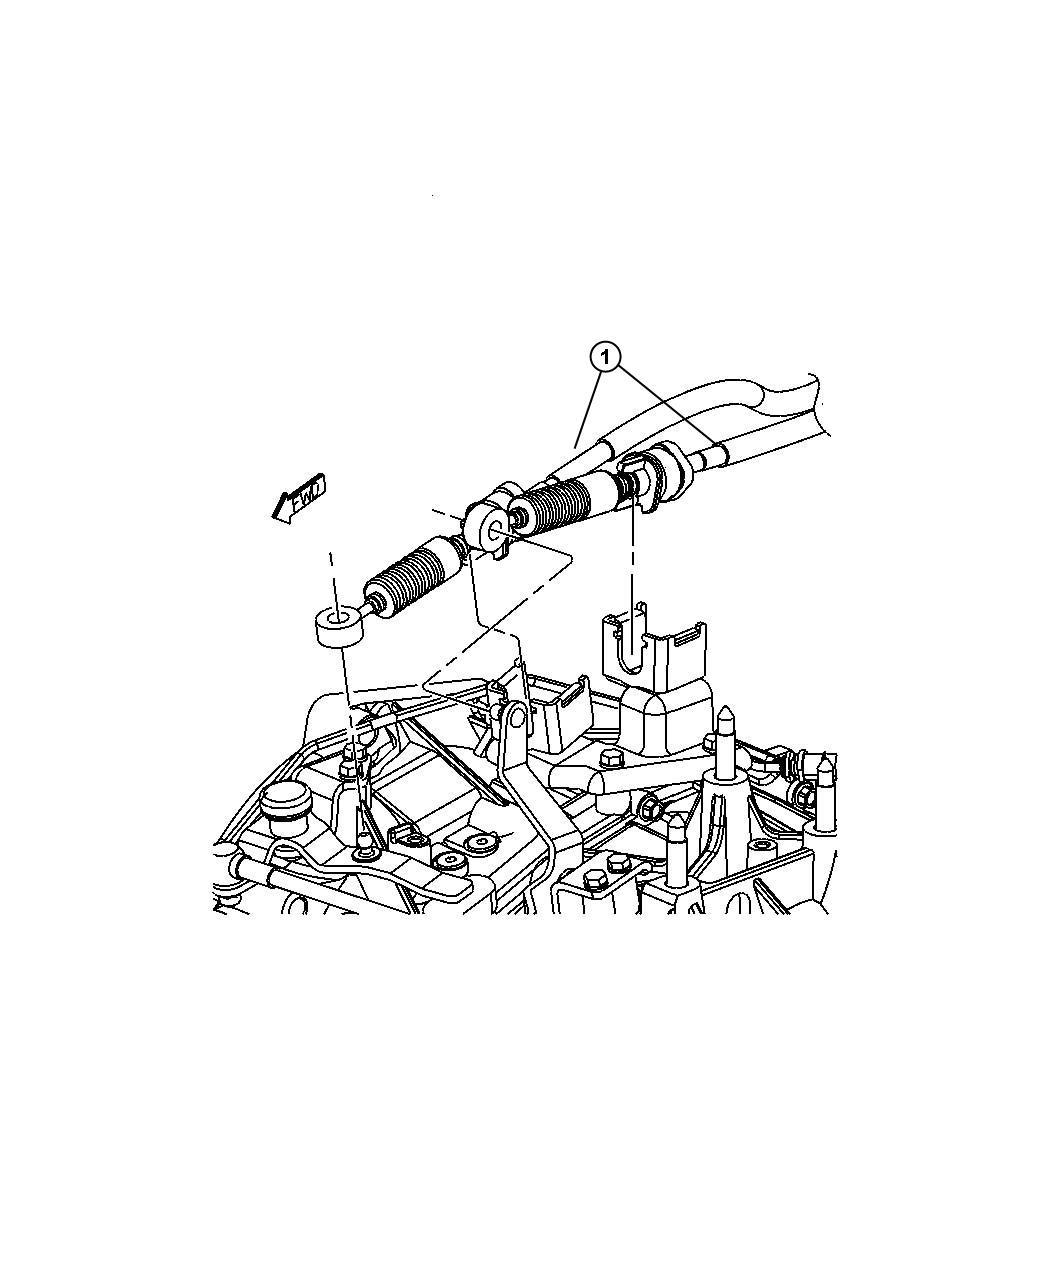 Dodge Caliber Fuel System Diagram